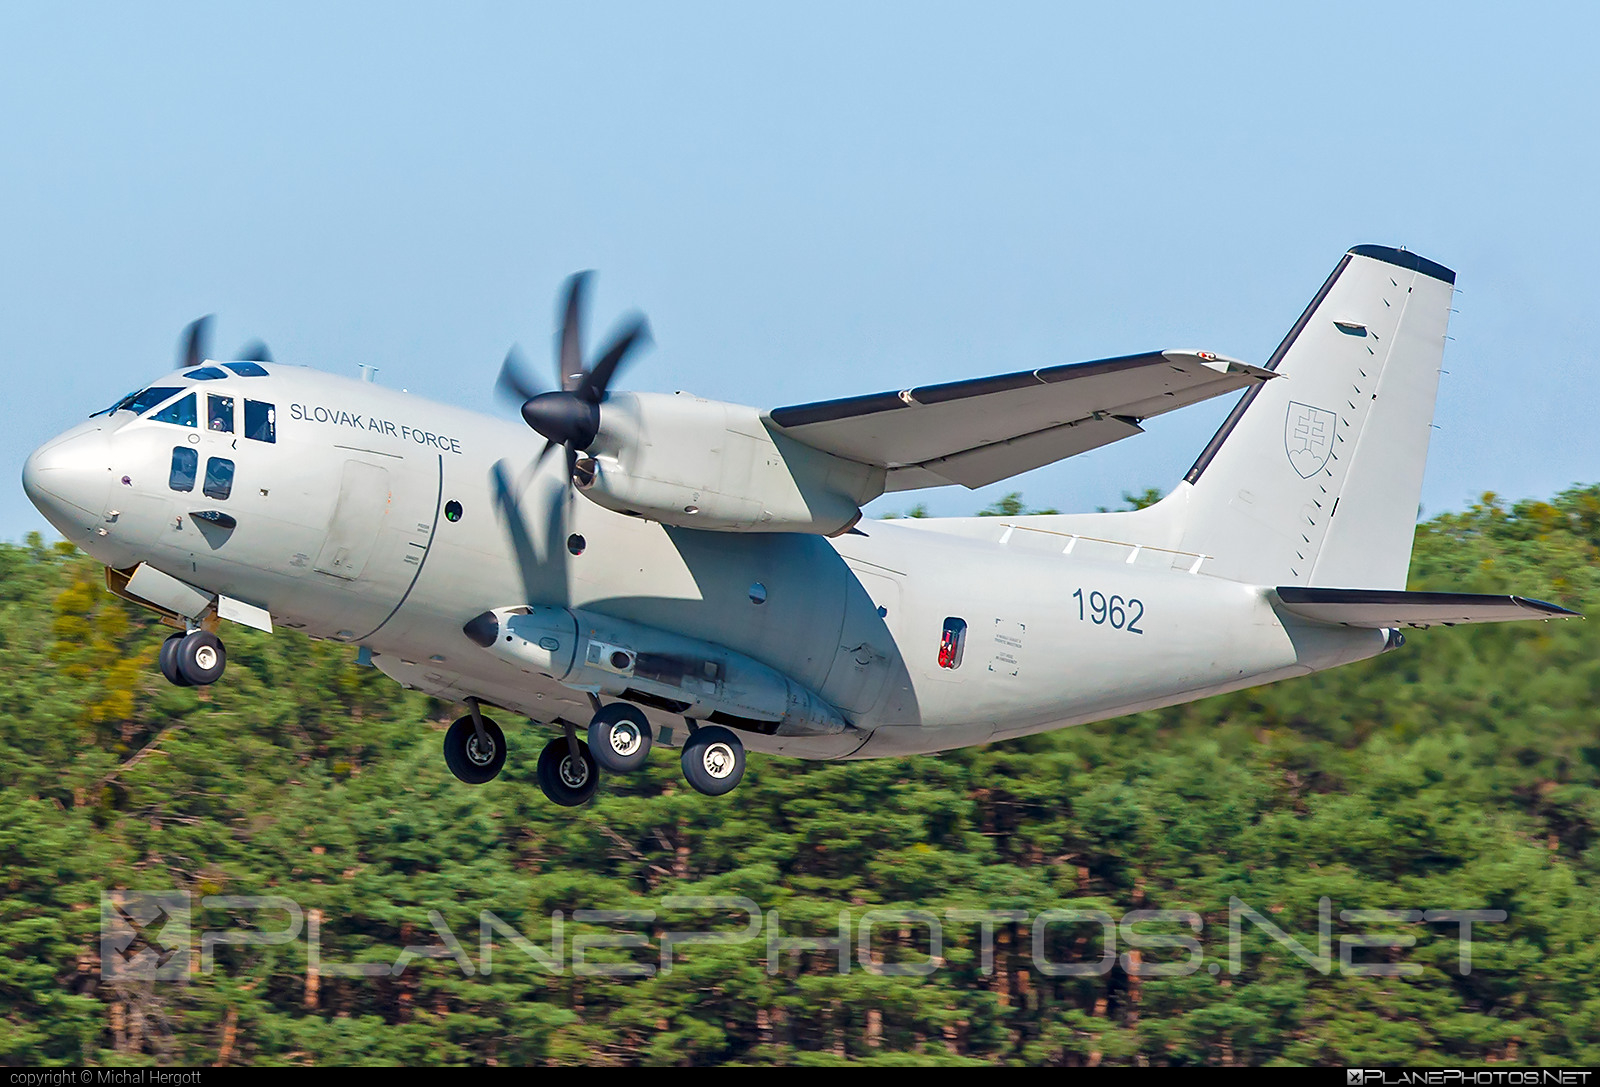 Leonardo C-27J Spartan - 1962 operated by Vzdušné sily OS SR (Slovak Air Force) #airshow #c27j #c27jspartan #c27spartan #leonardo #leonardo27j #leonardoc27jspartan #leonardospartan #siaf #siaf2021 #slovakairforce #vzdusnesilyossr